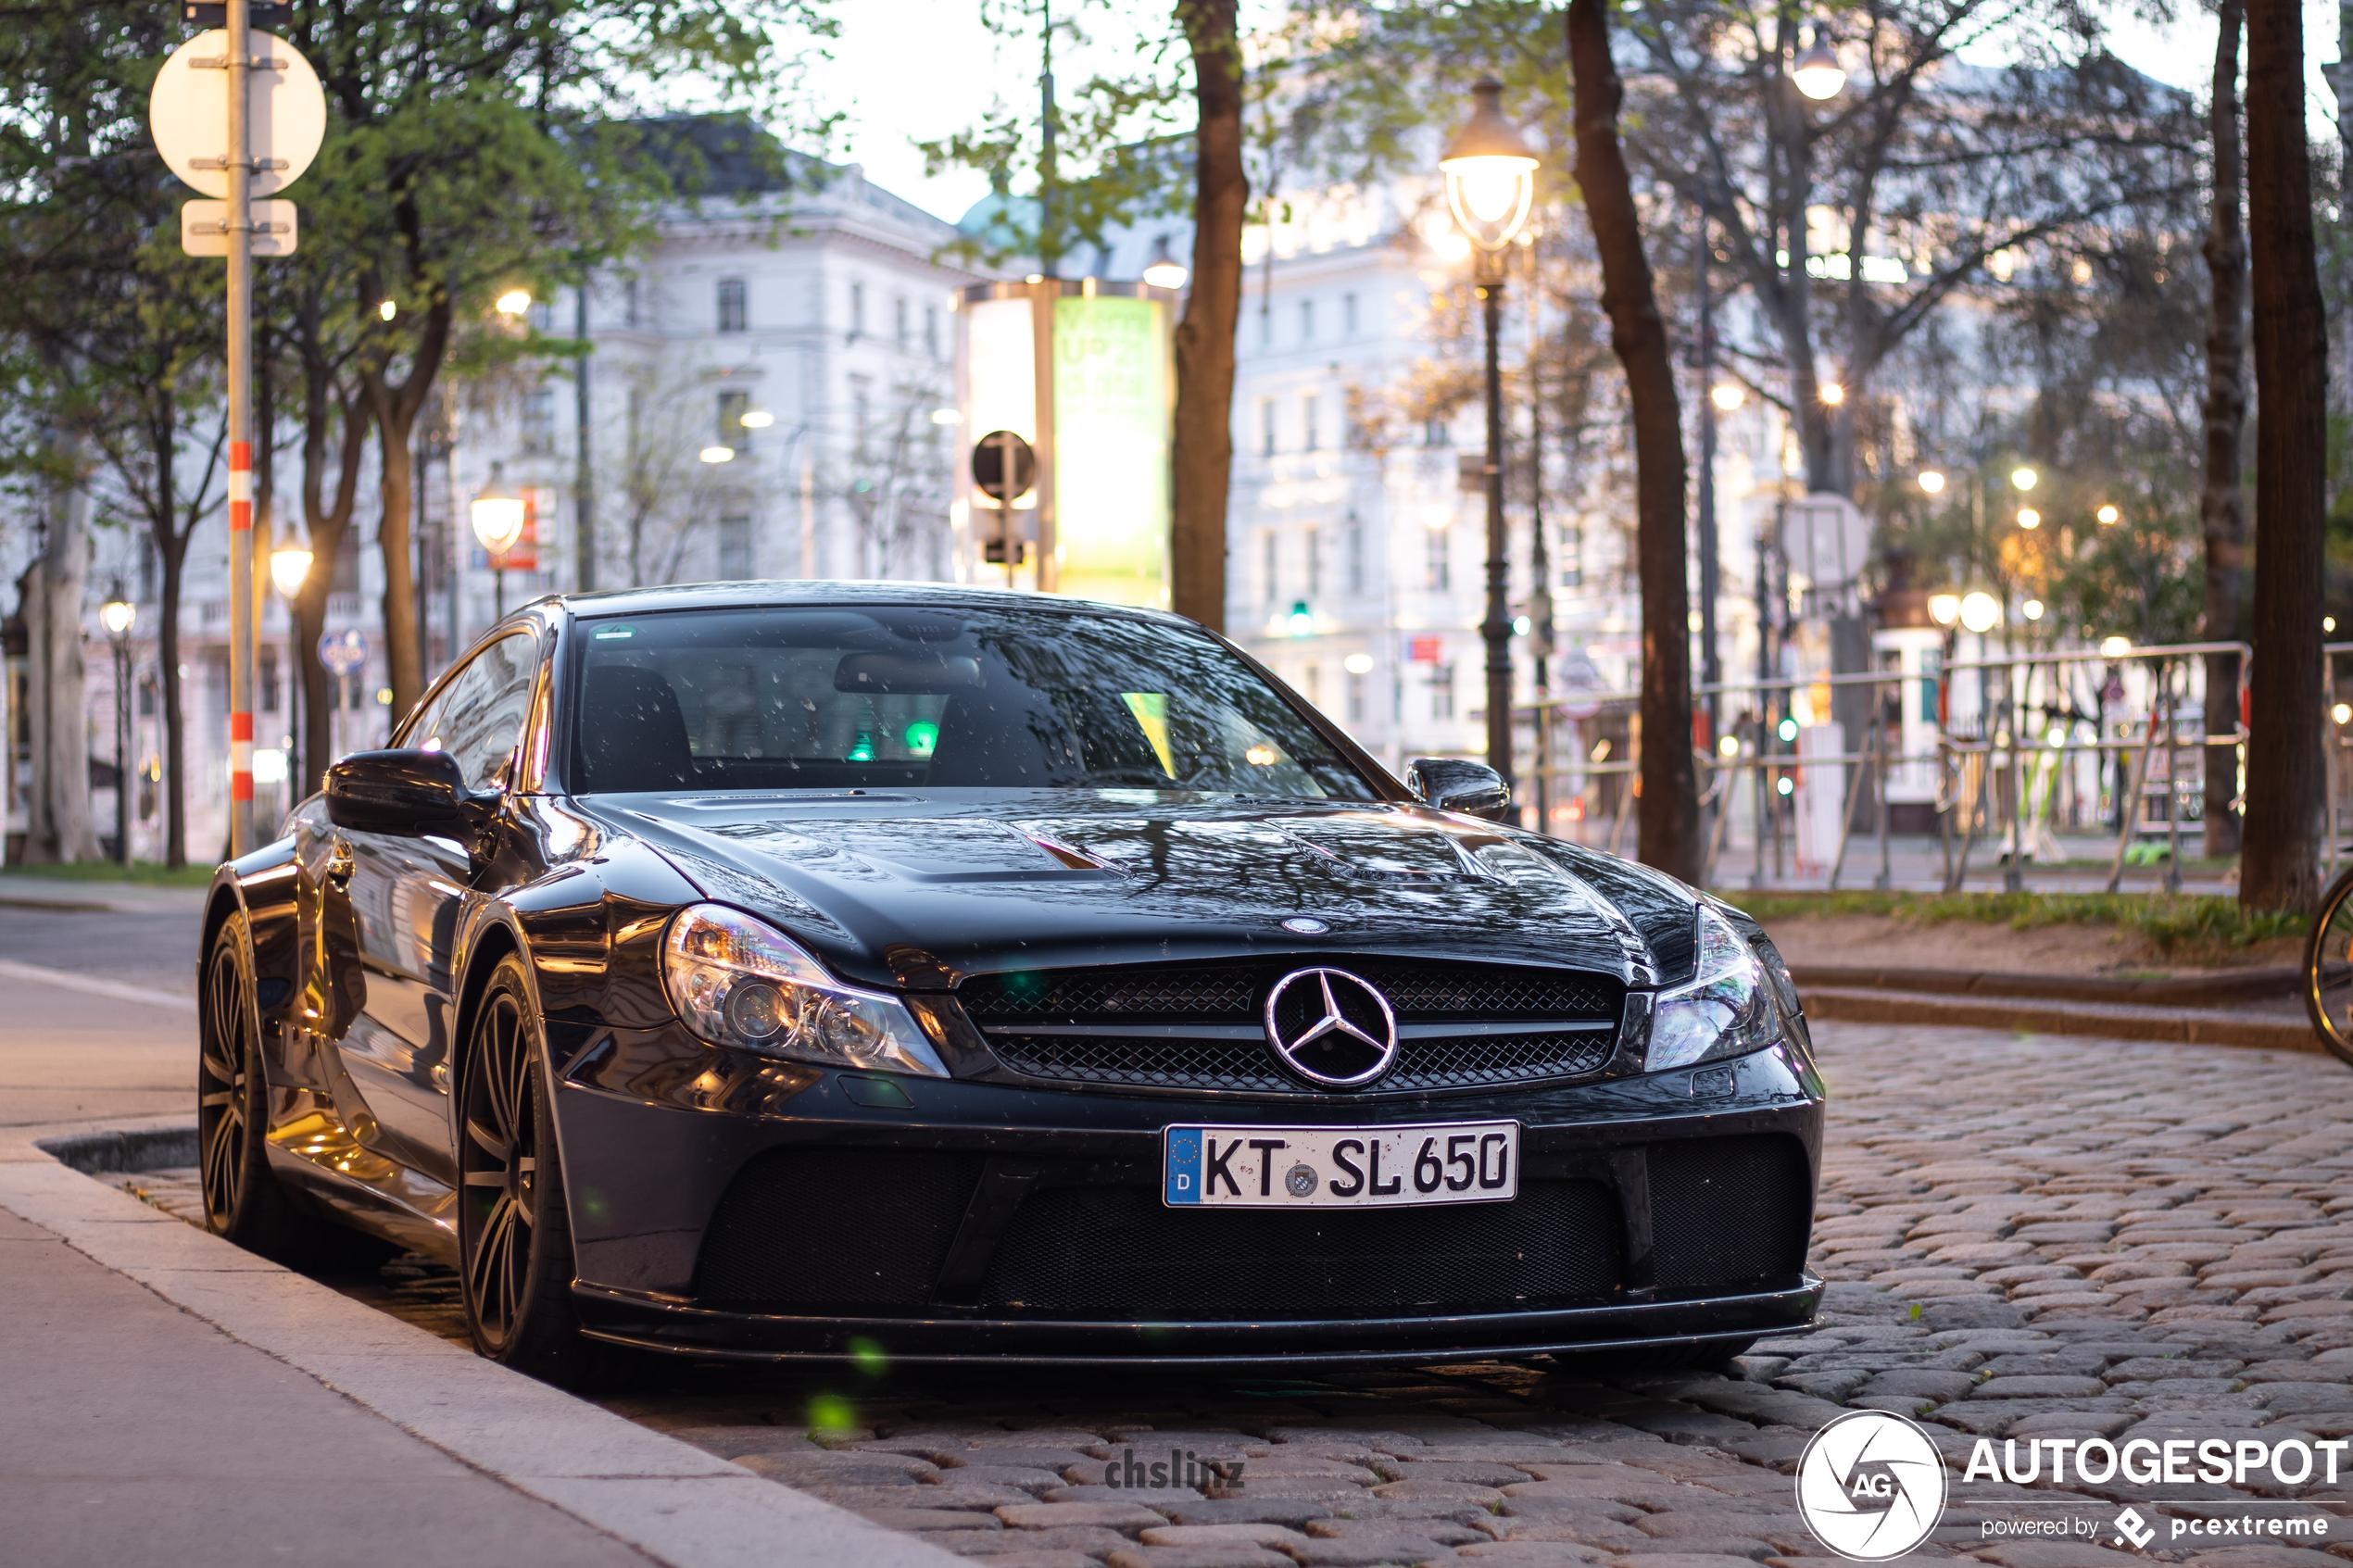 Mercedes-BenzSL 65 AMG Black Series